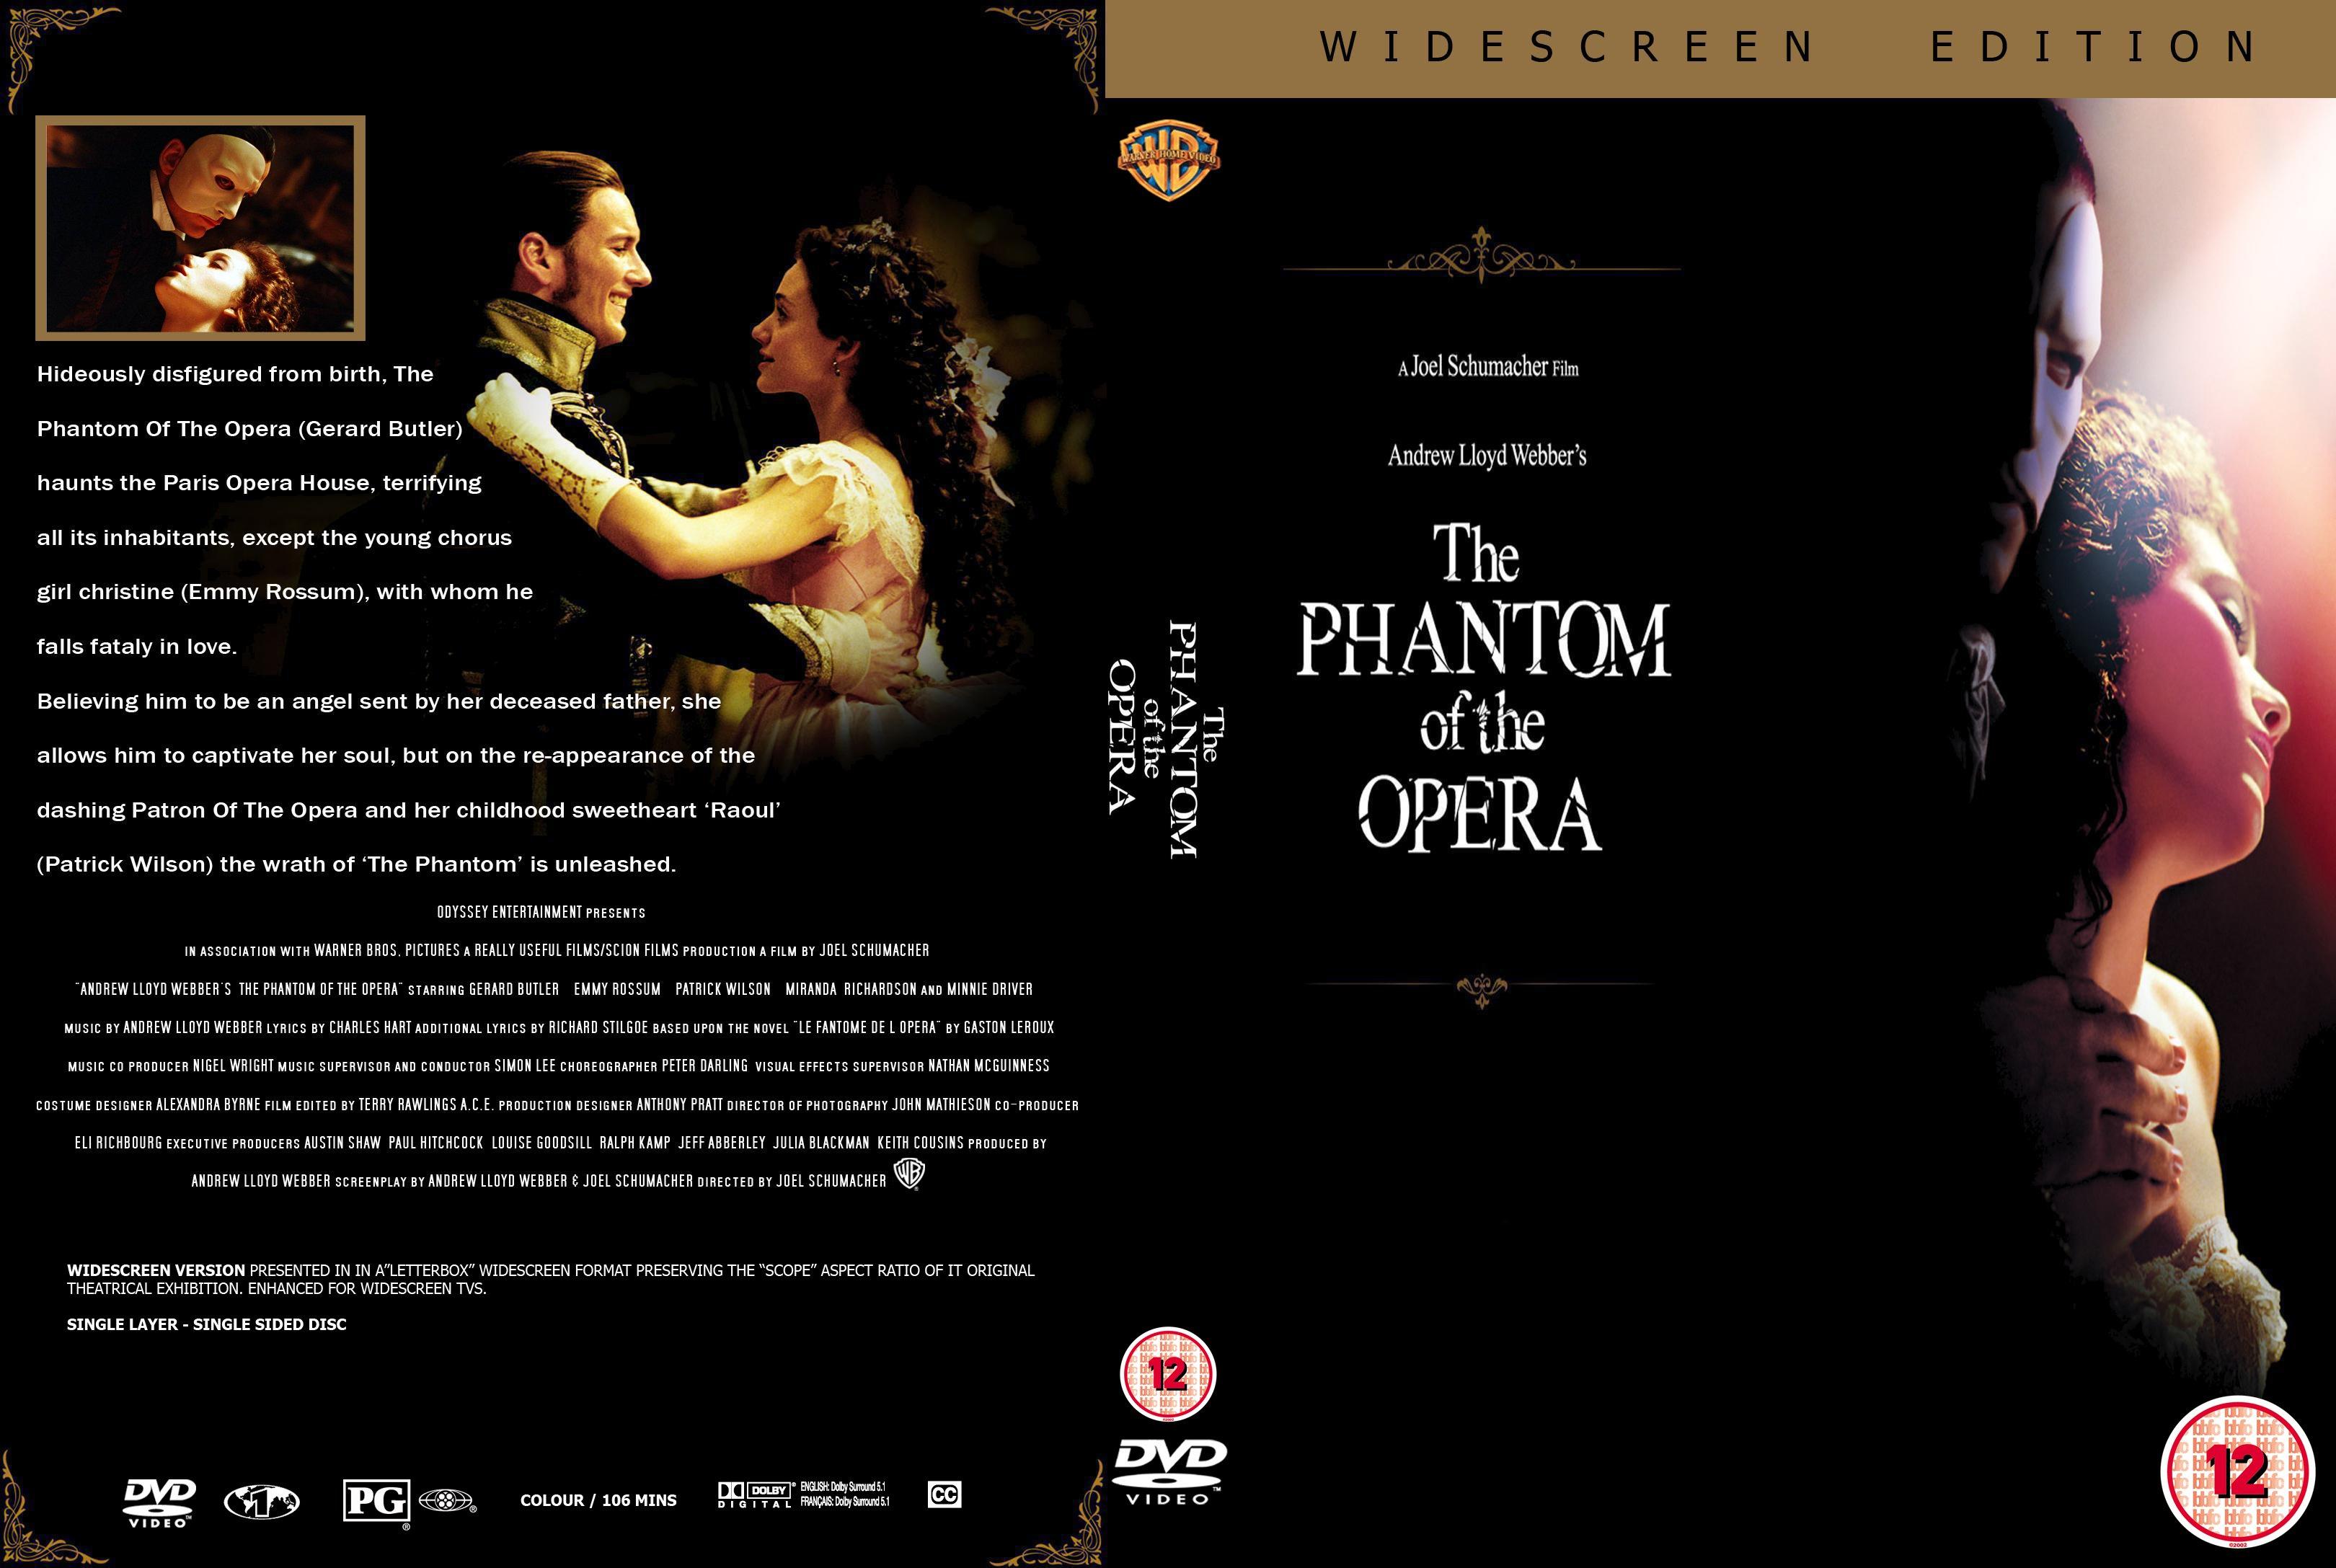 Phantom Of The Opera Drama Musical Romance Phanton Opera Horror Wallpaper 3240x2175 411624 Wallpaperup